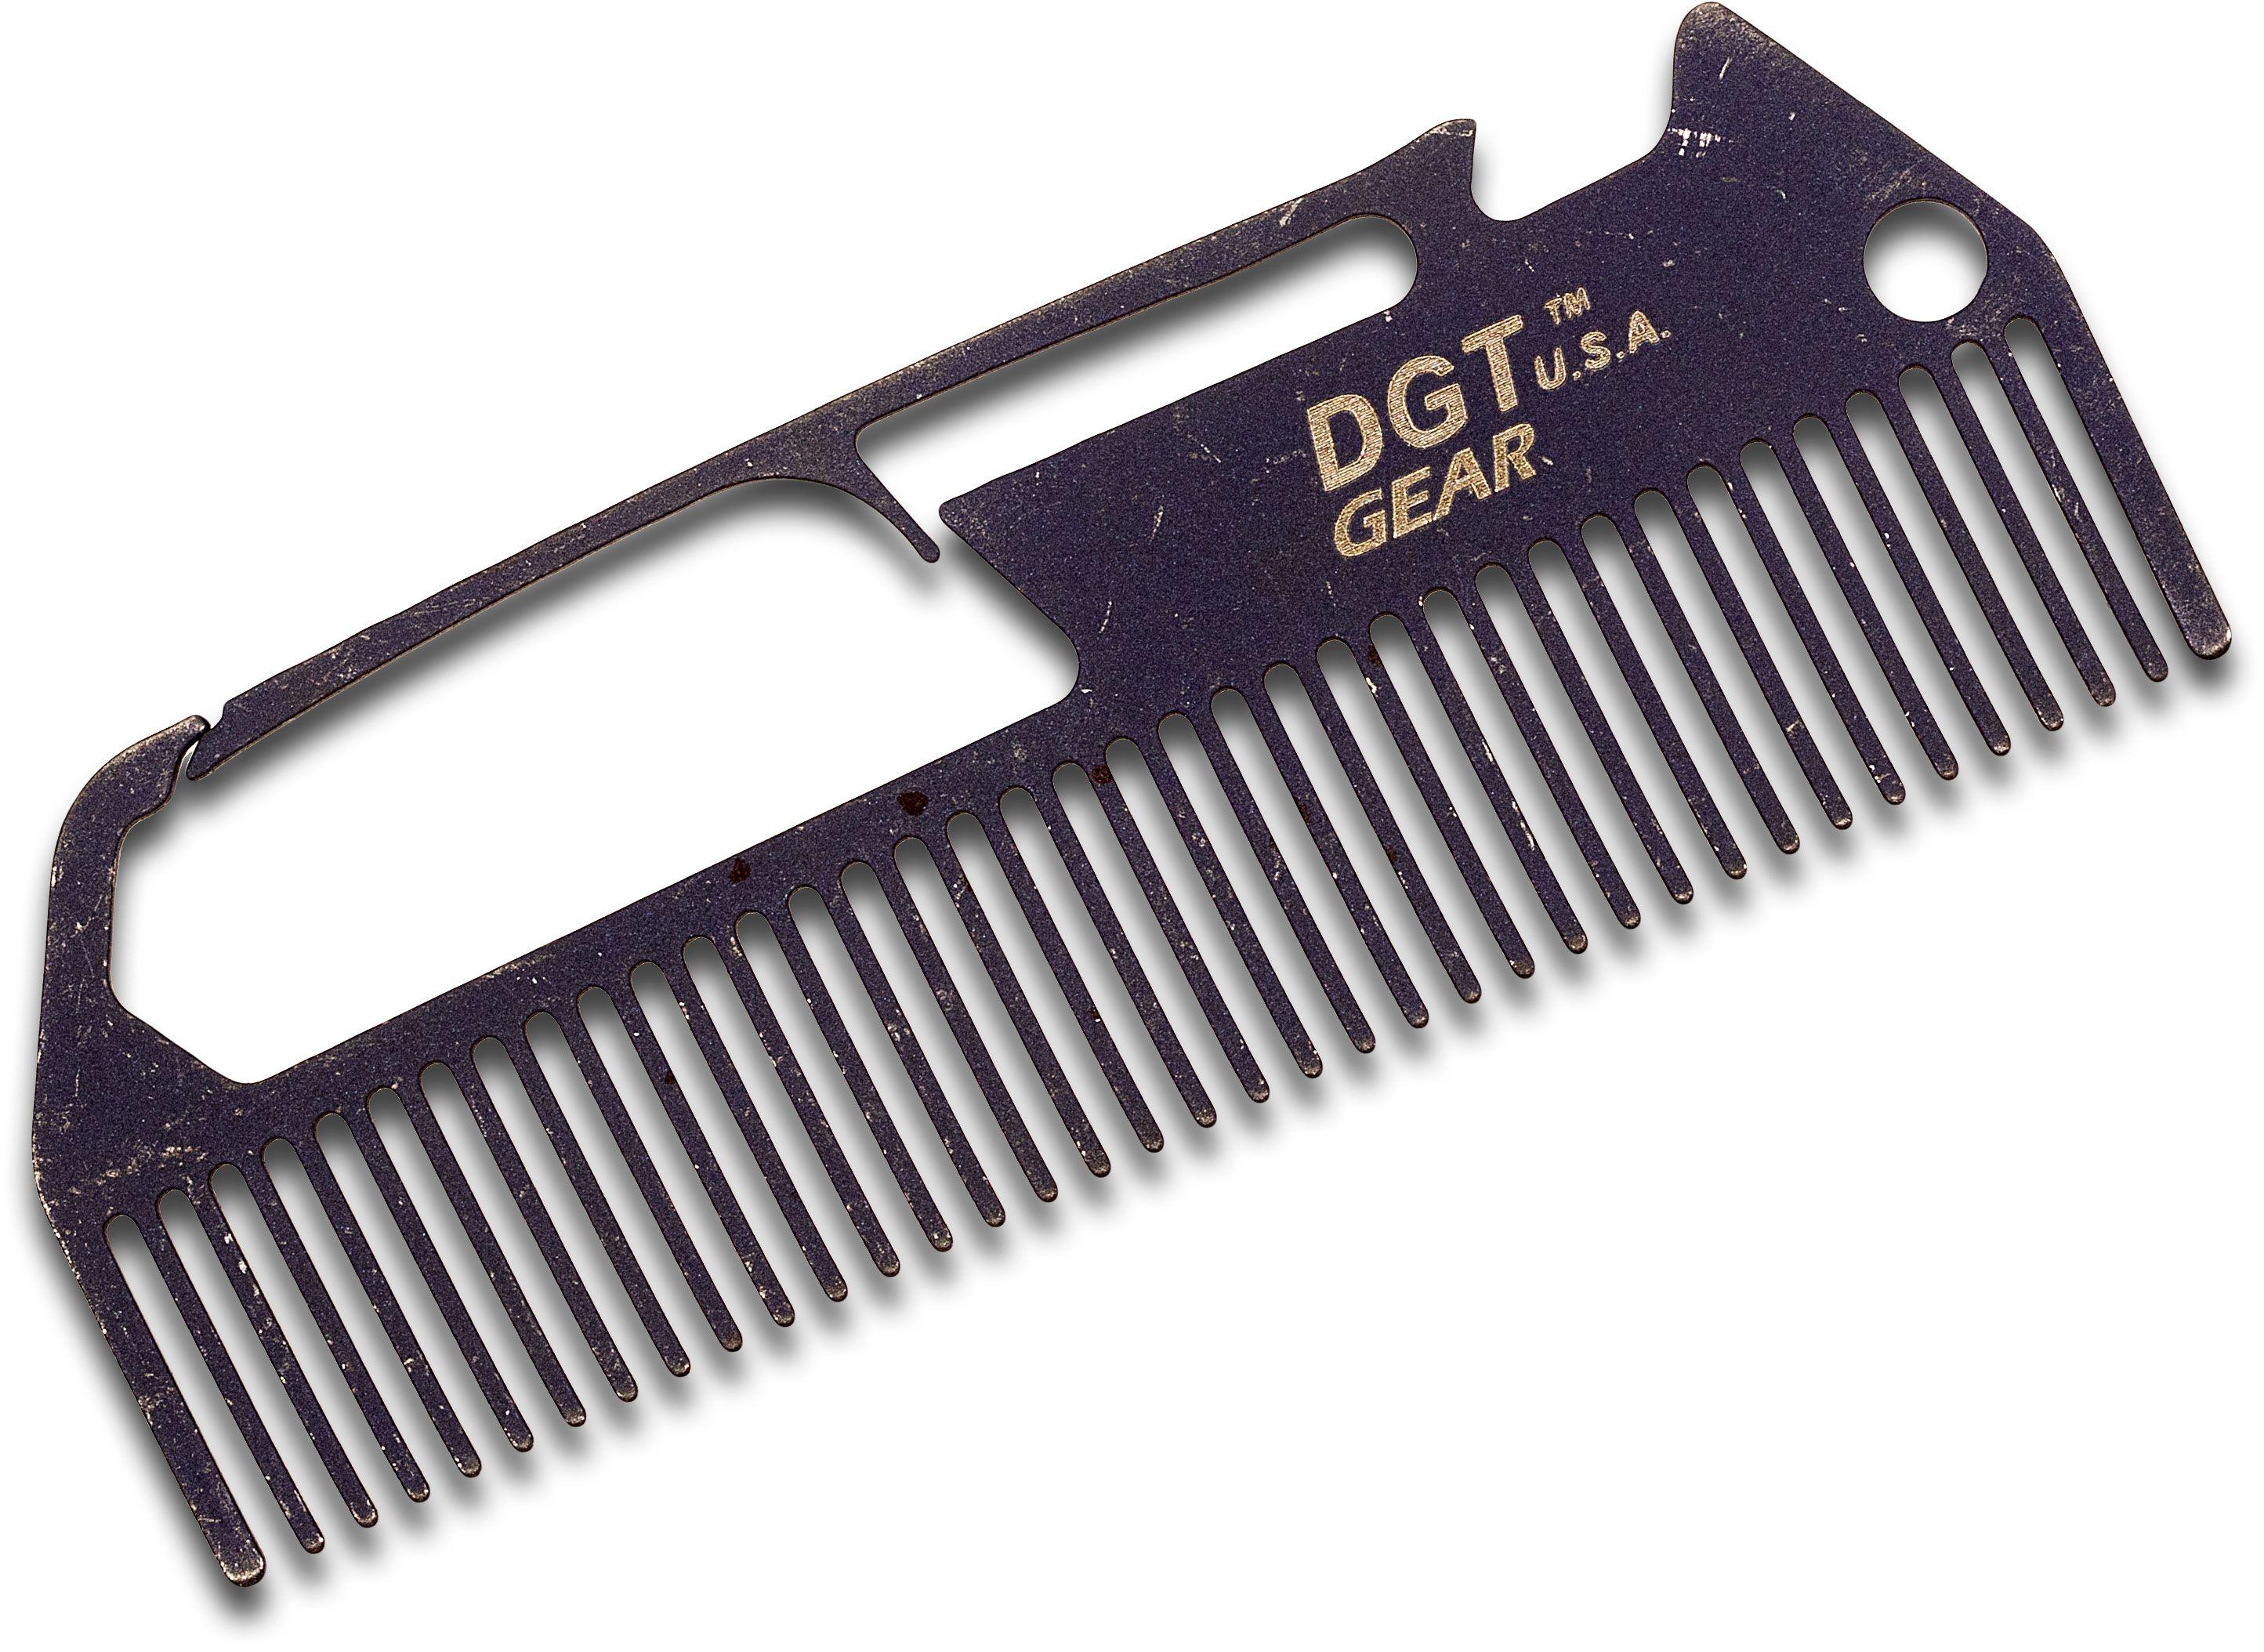 DGT Gear Titanium Comb-Biner One-Piece Multi-Tool, Battleworn